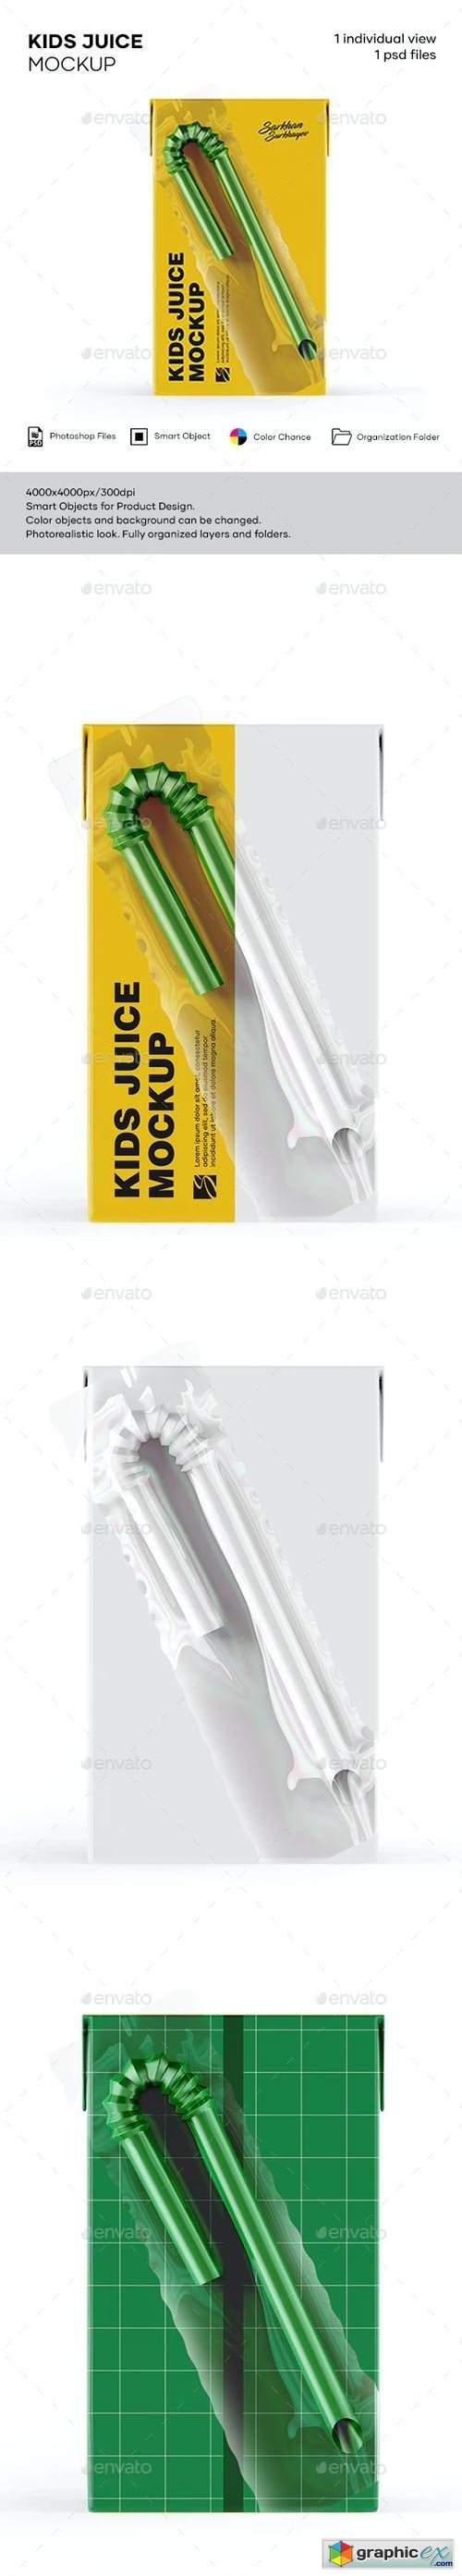 125ml Juice Carton Box with Straw Mockup